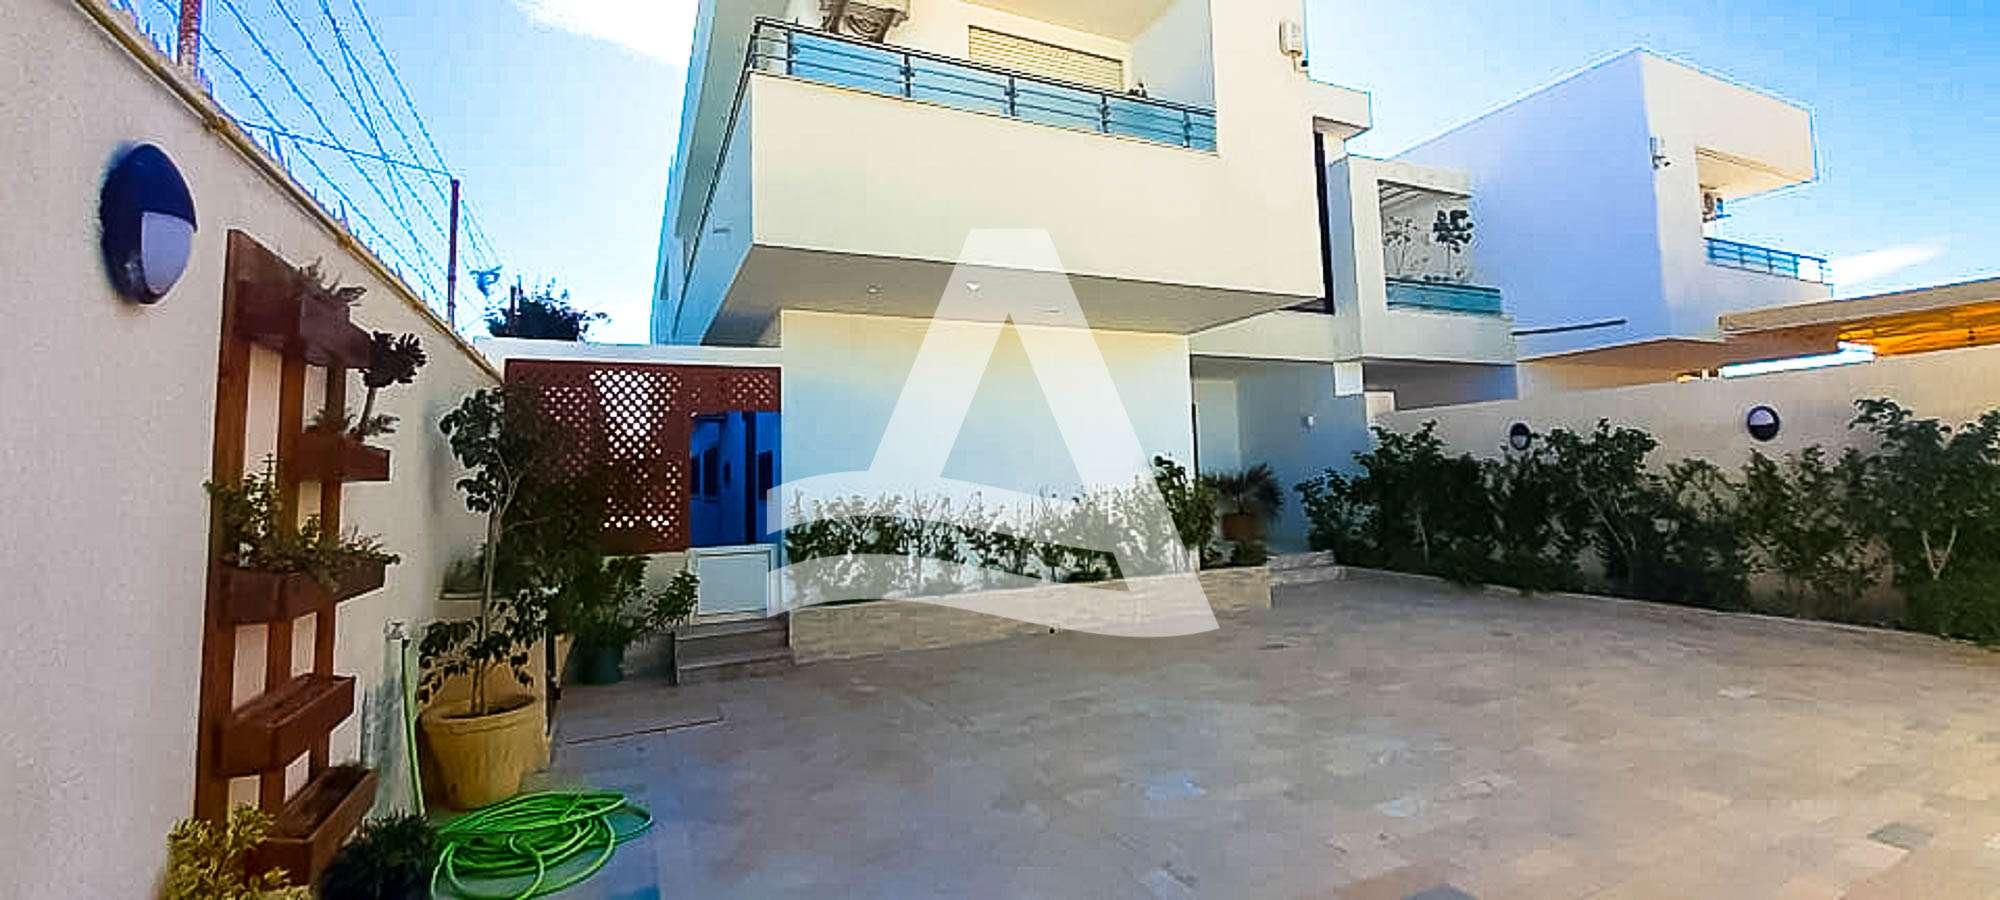 httpss3.amazonaws.comlogimoaws_Arcane_immobilière_la_Marsa-_location_-_vente_la_marsa_9_sur_21_1574354370817-1